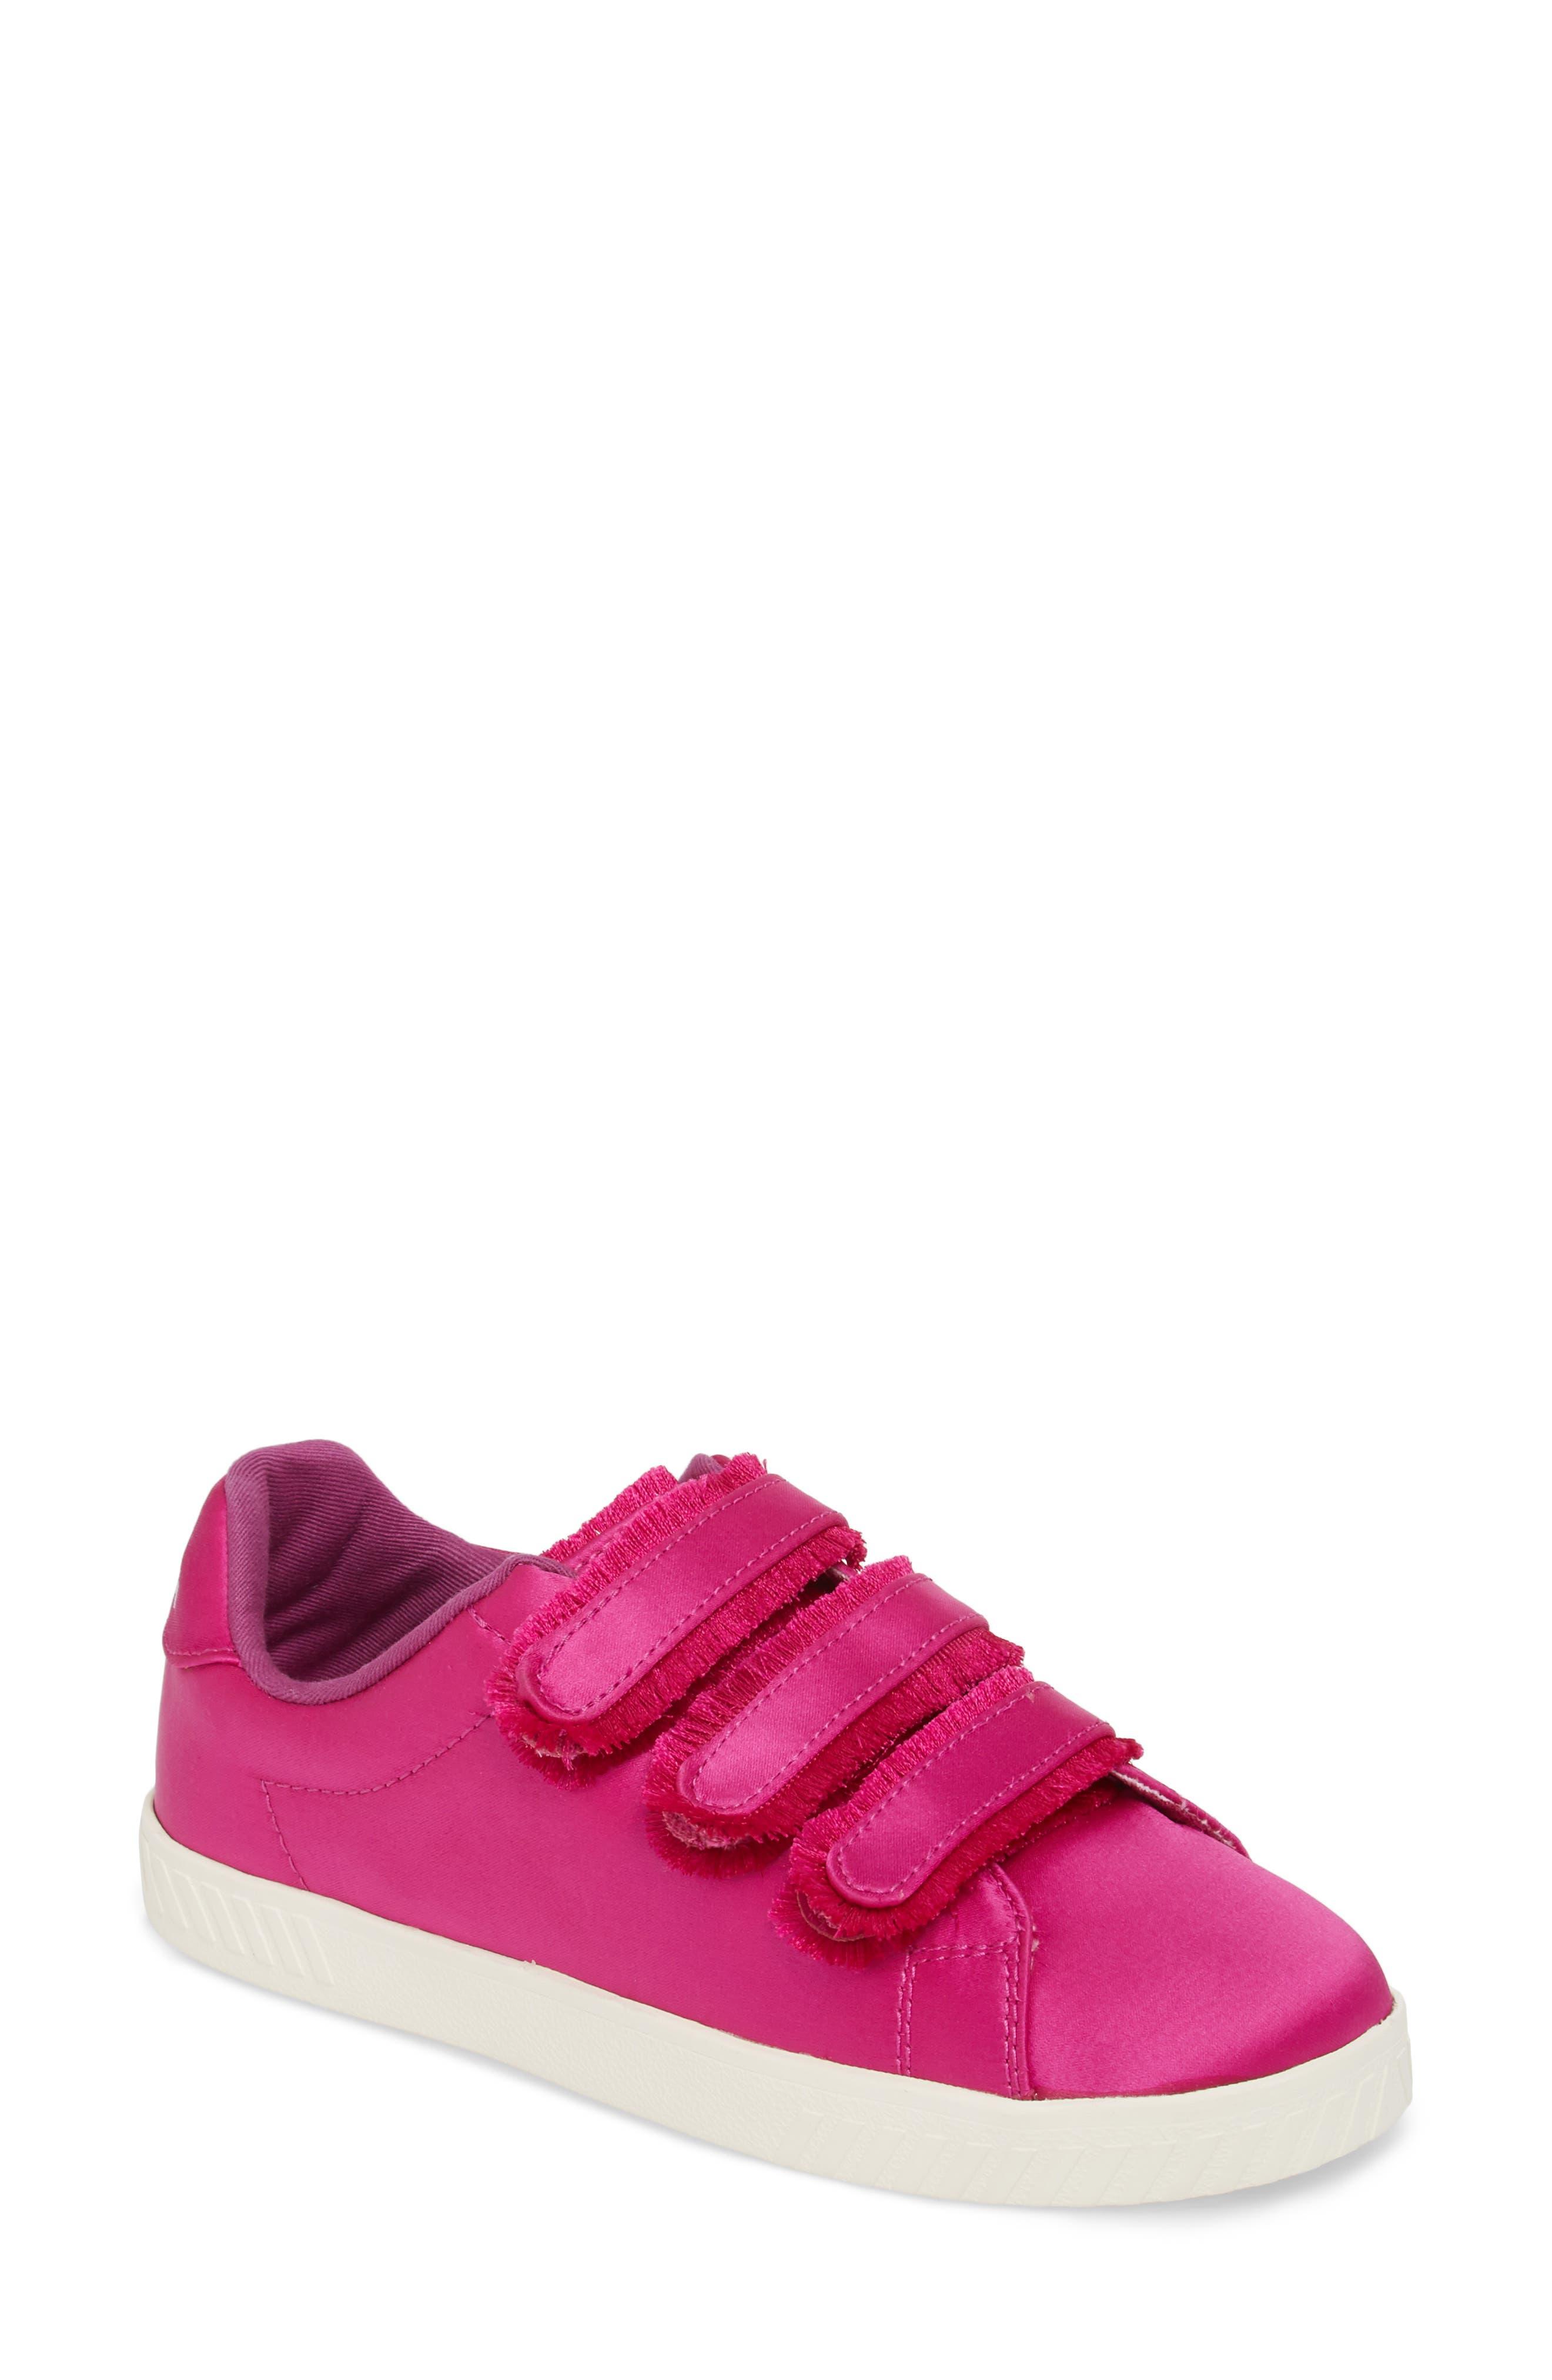 Fringed Strap Sneaker,                             Main thumbnail 1, color,                             FUCHSIA SATIN